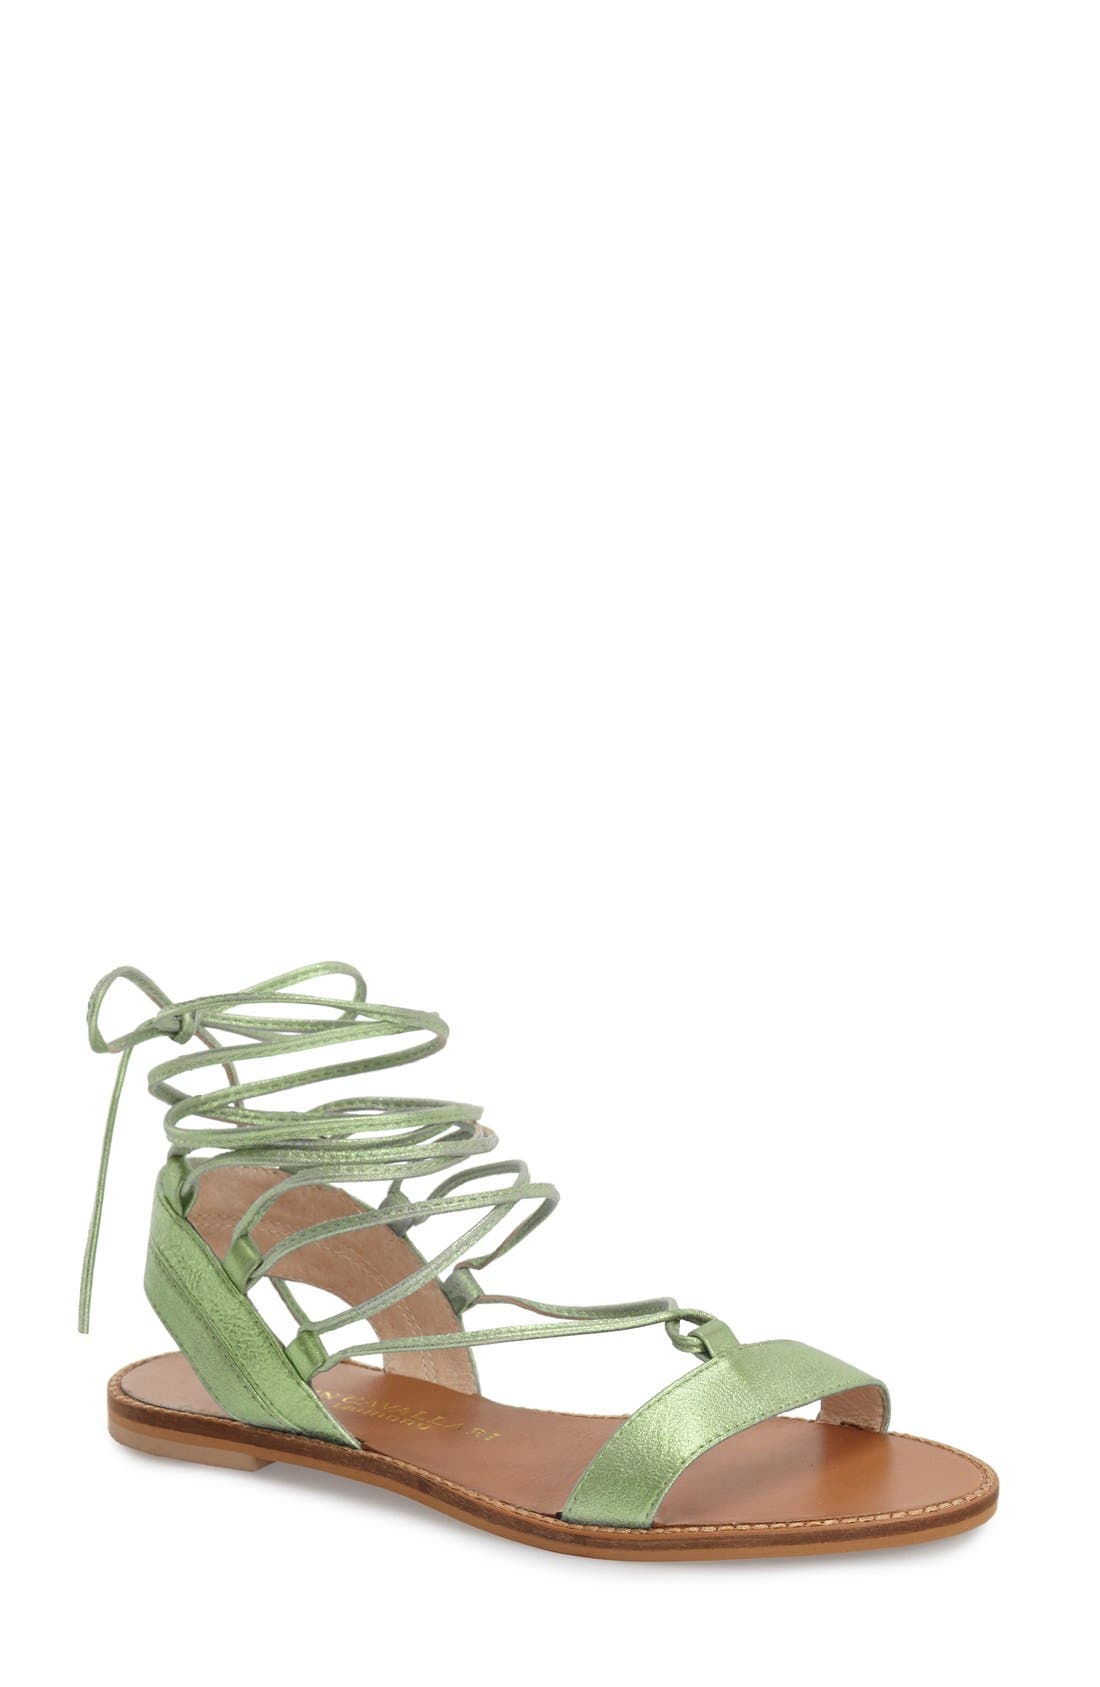 Main Image - Kristin Cavallari 'Belle' Lace-Up Sandal (Women)